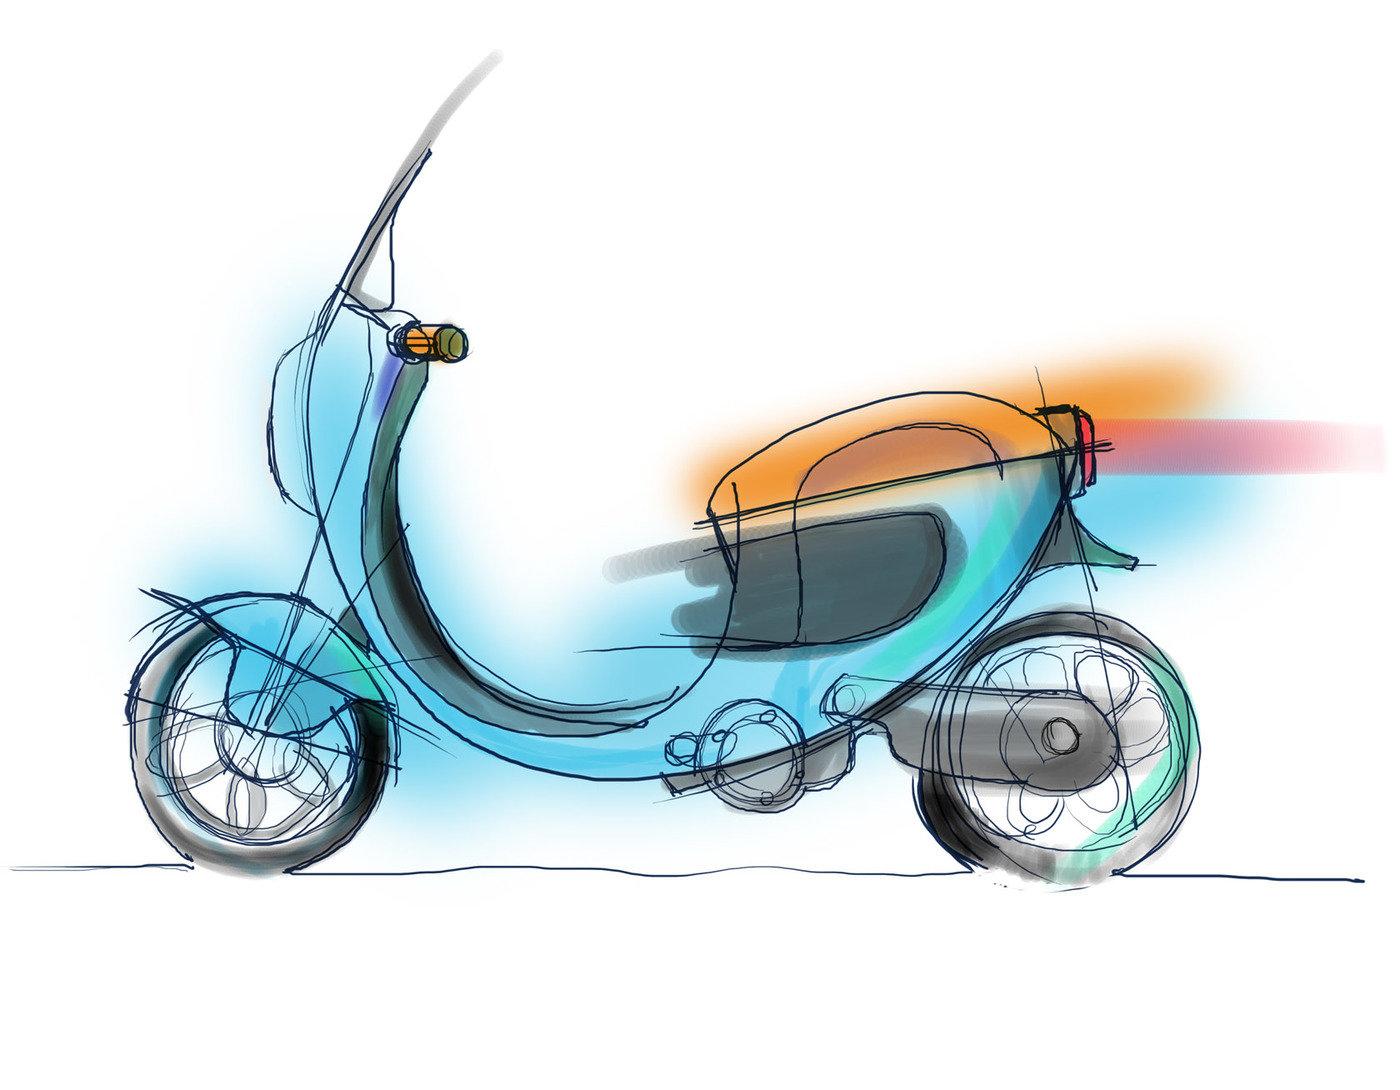 Transportation Sketches by Patricio Corvalan at Coroflot.com